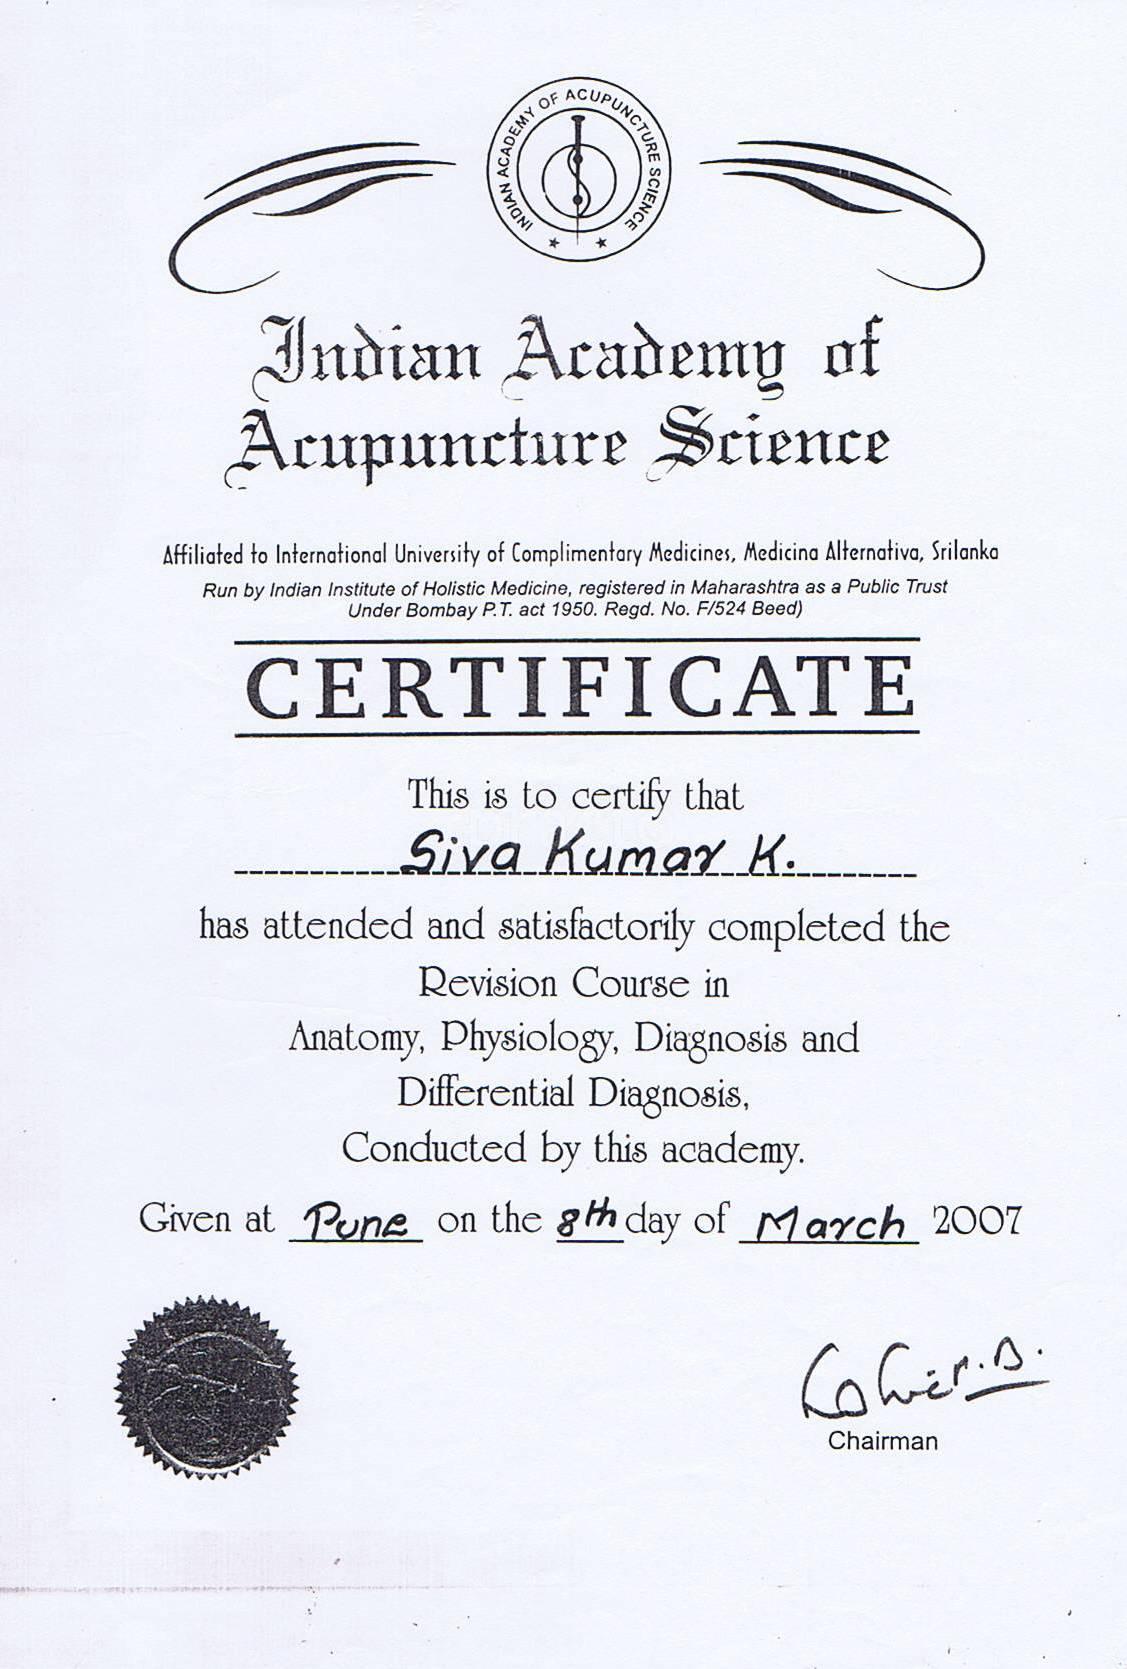 Best Alternative Medicine Clinics in Kovilambakkam, Chennai - Book